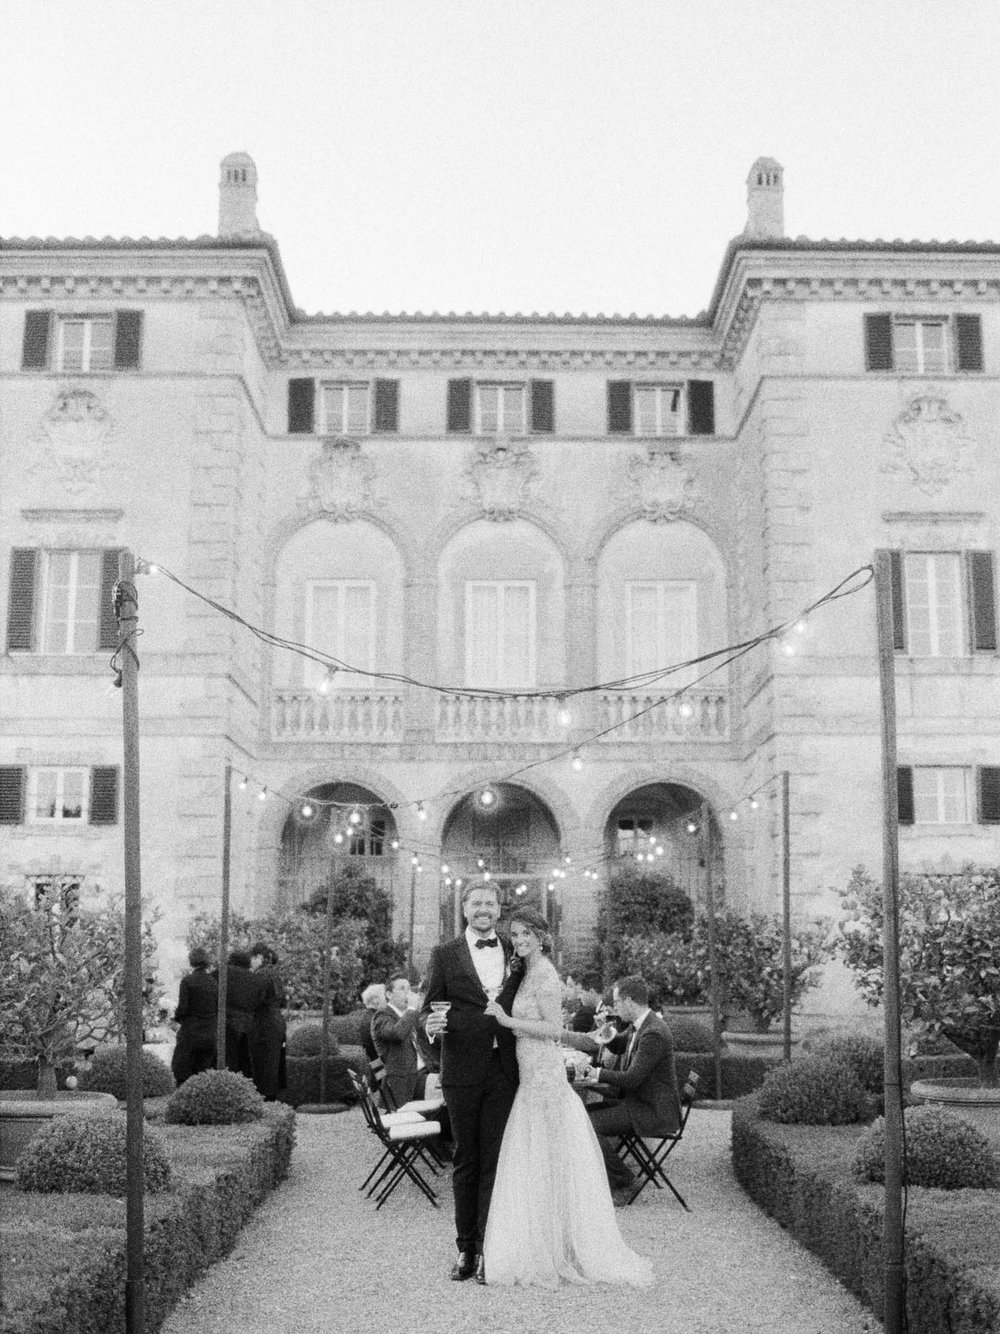 Villa_Cetinale_Wedding-54-Jen_Huang-ElanJacob-333-Jen_Huang-000058470019.jpg